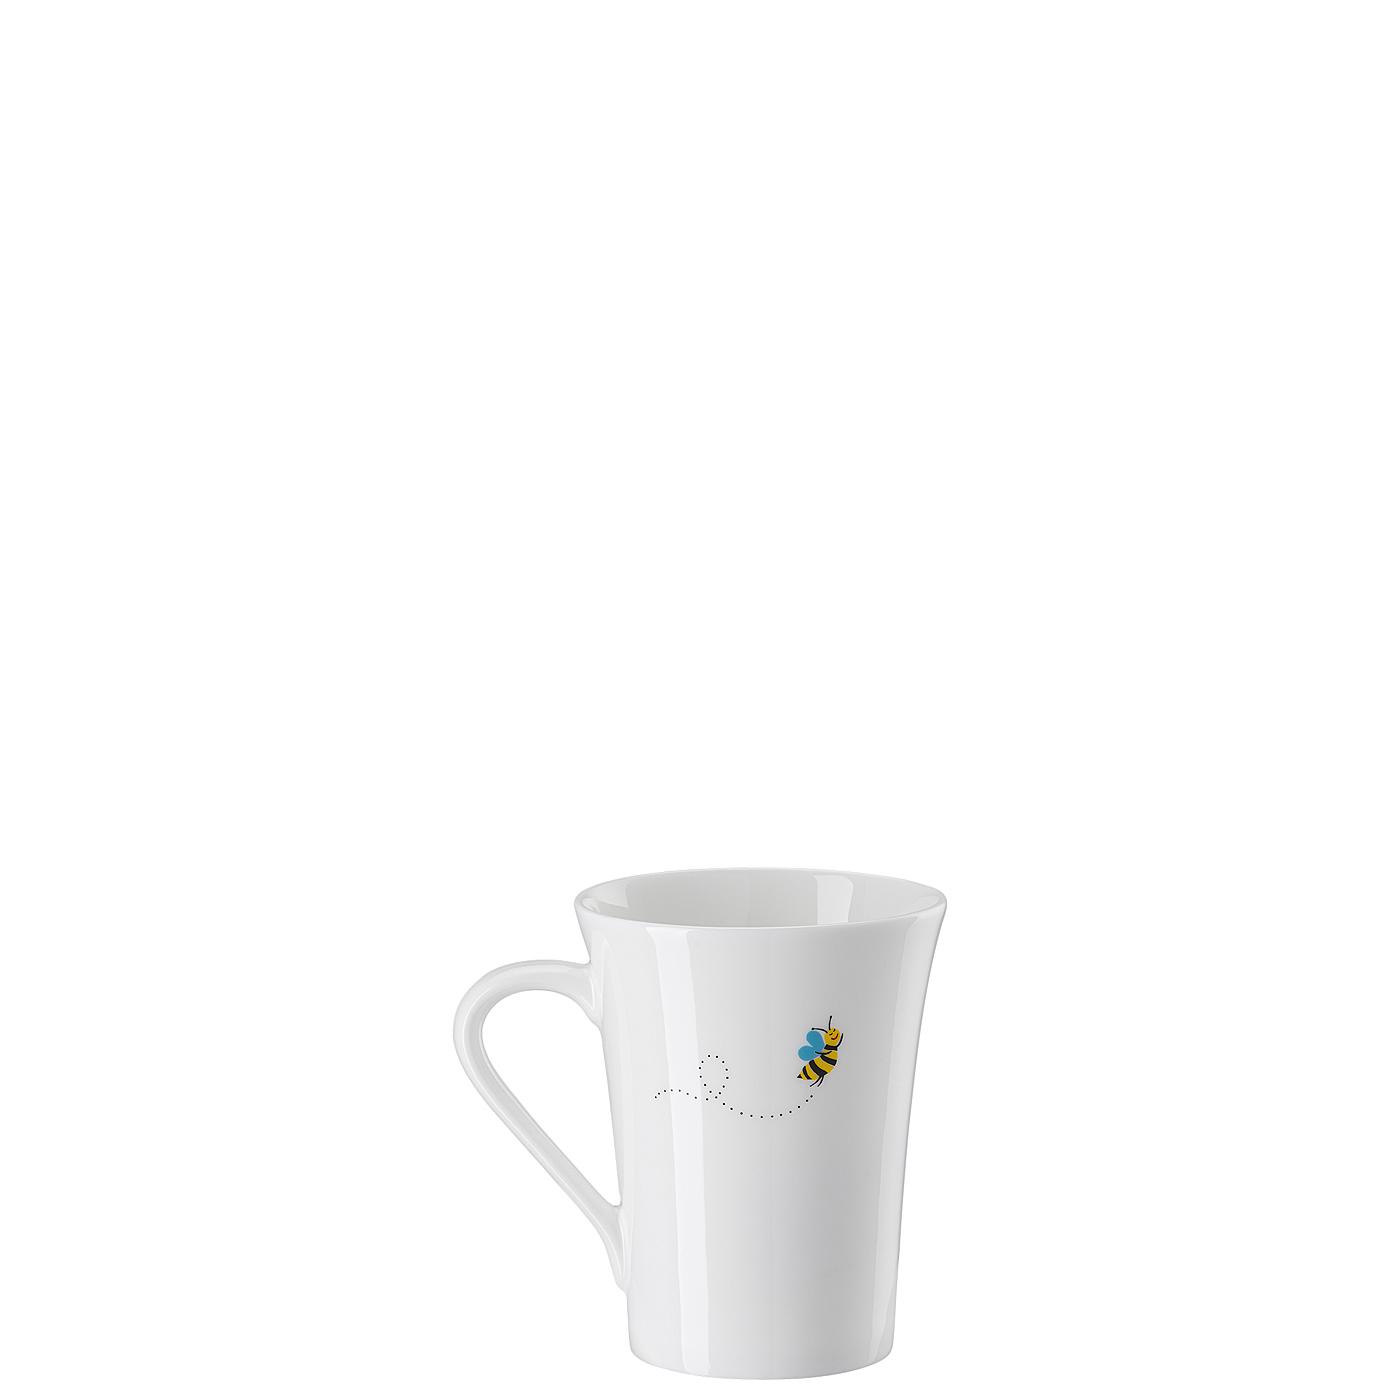 Becher mit Henkel My Mug Collection Bees - Bee positive Hutschenreuther